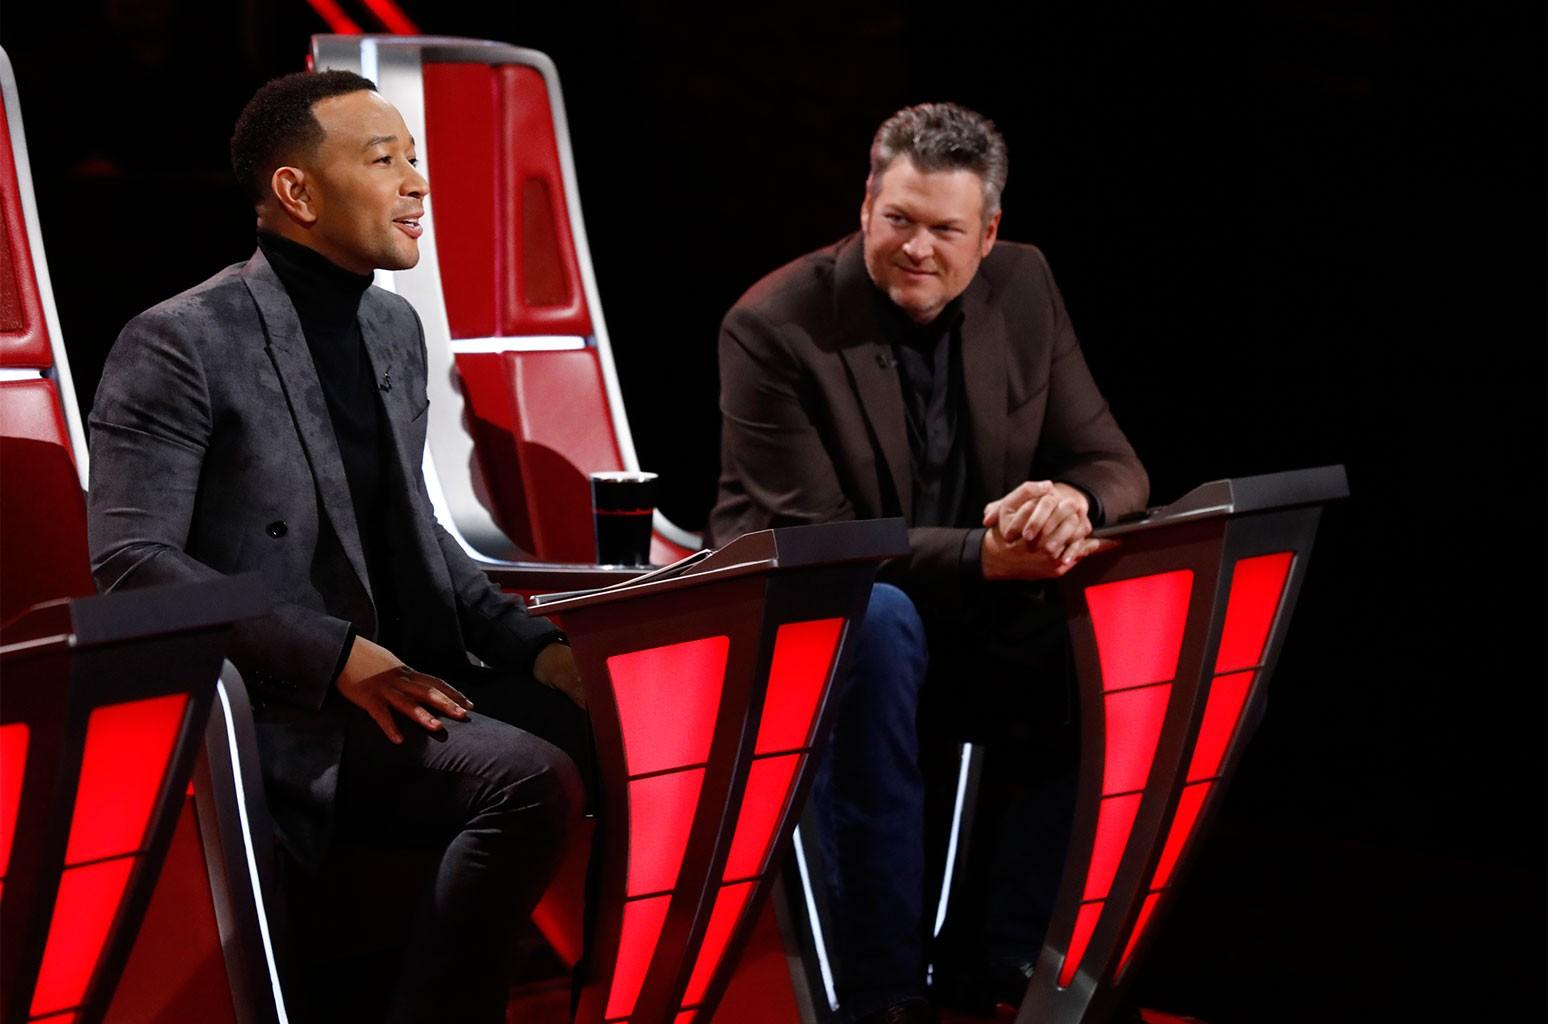 John Legend and Blake Shelton